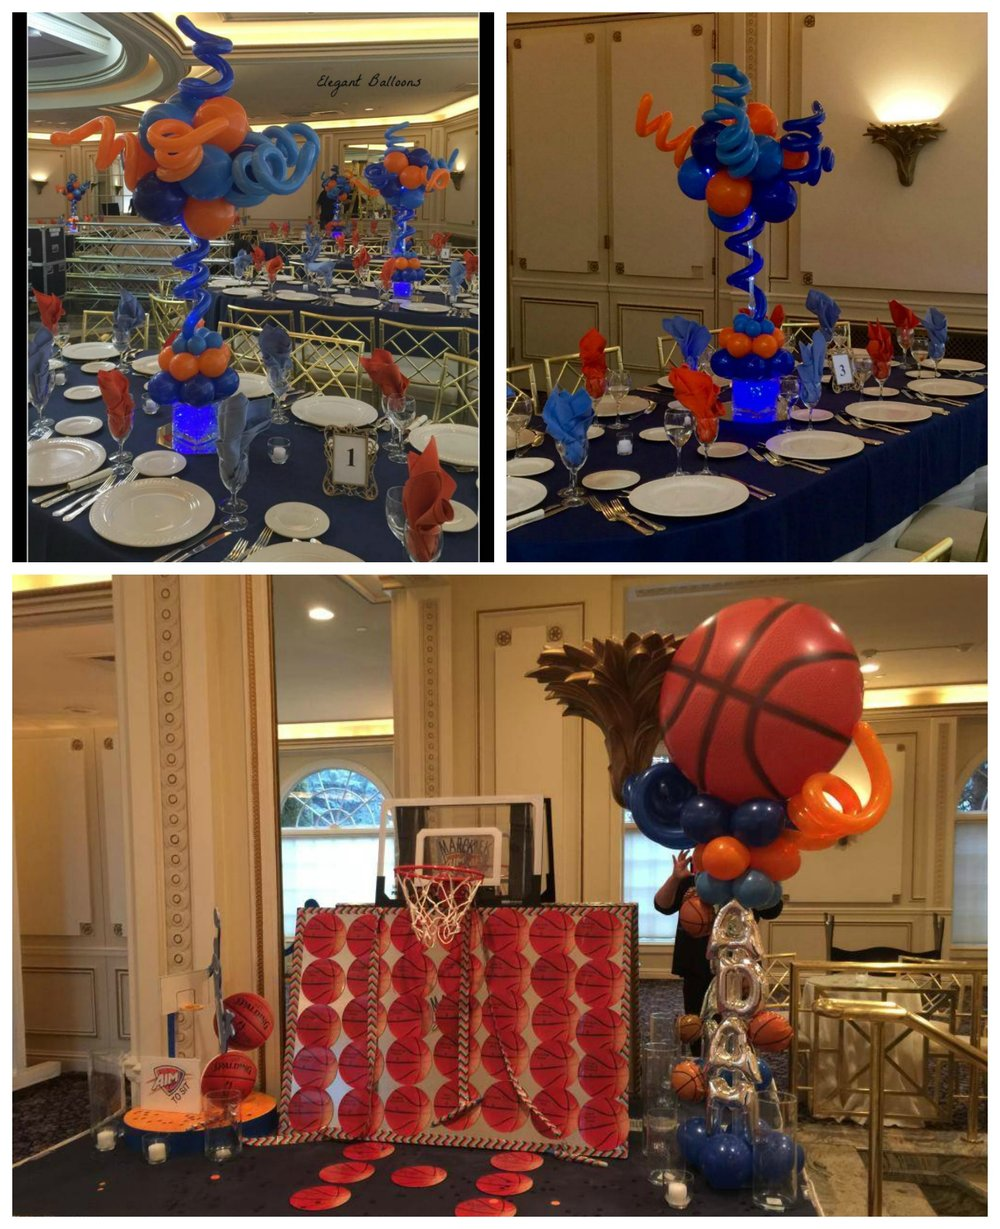 Basketball Knicks theme